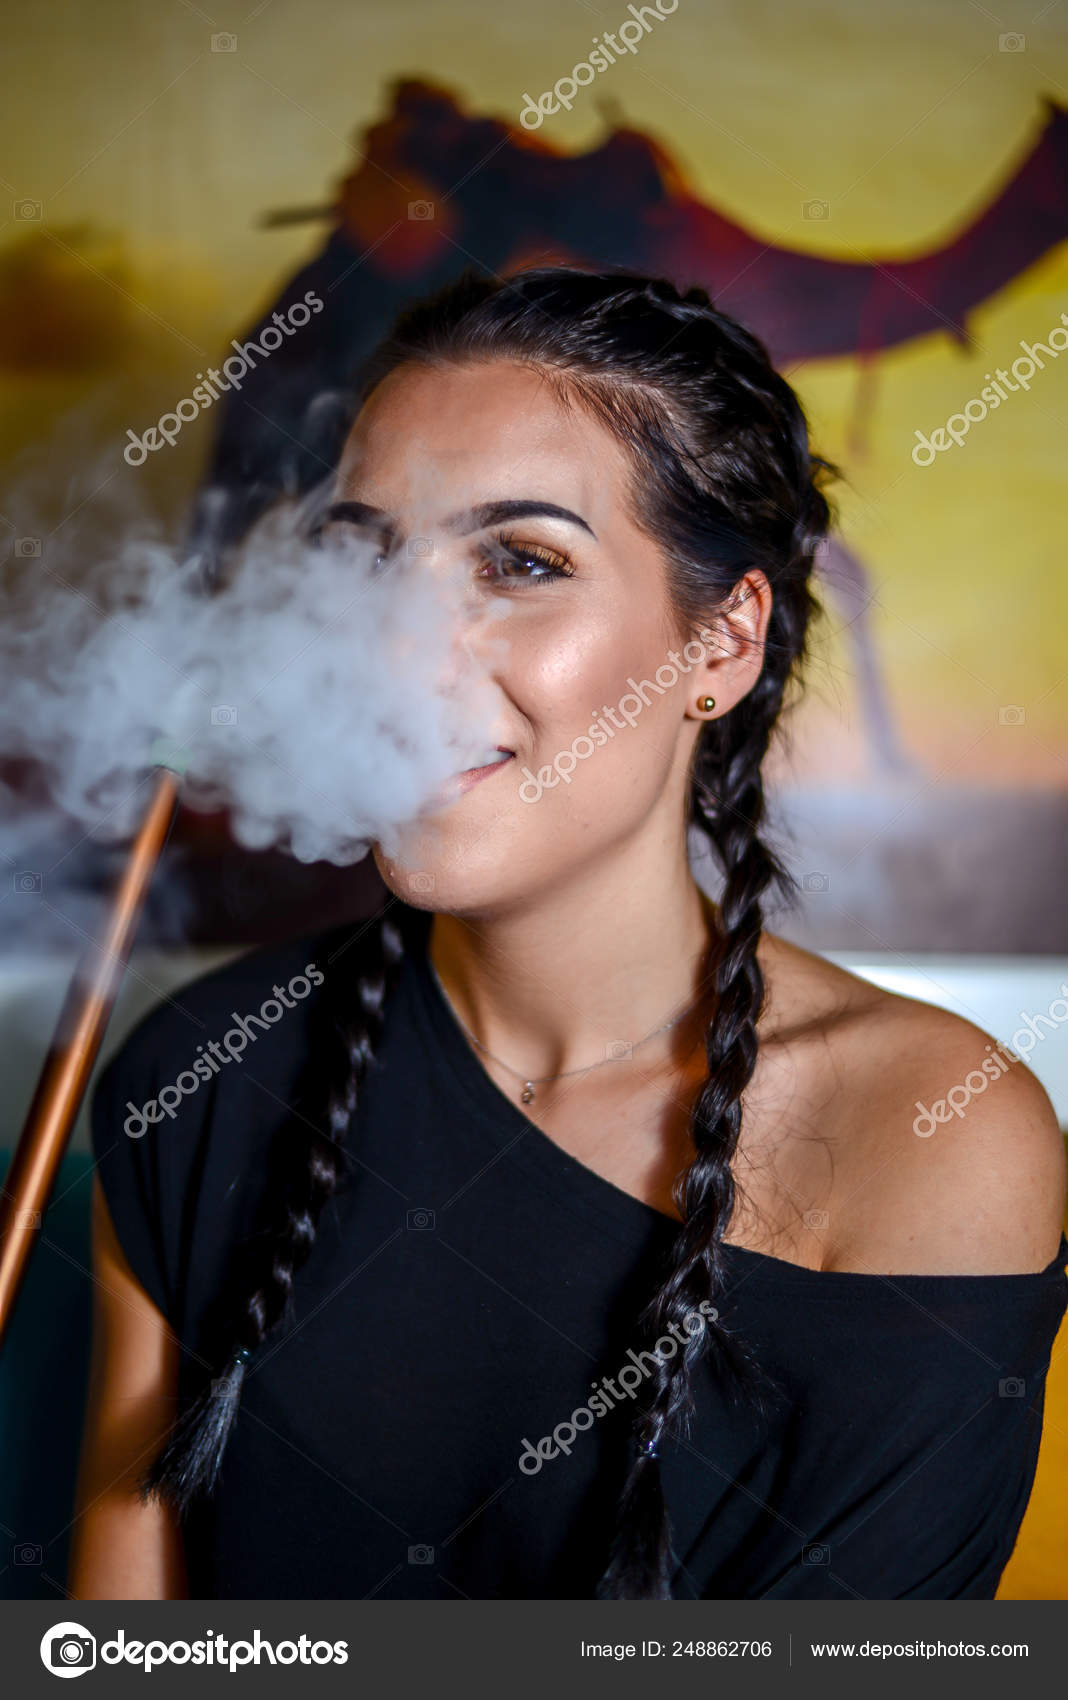 Hot girl pict